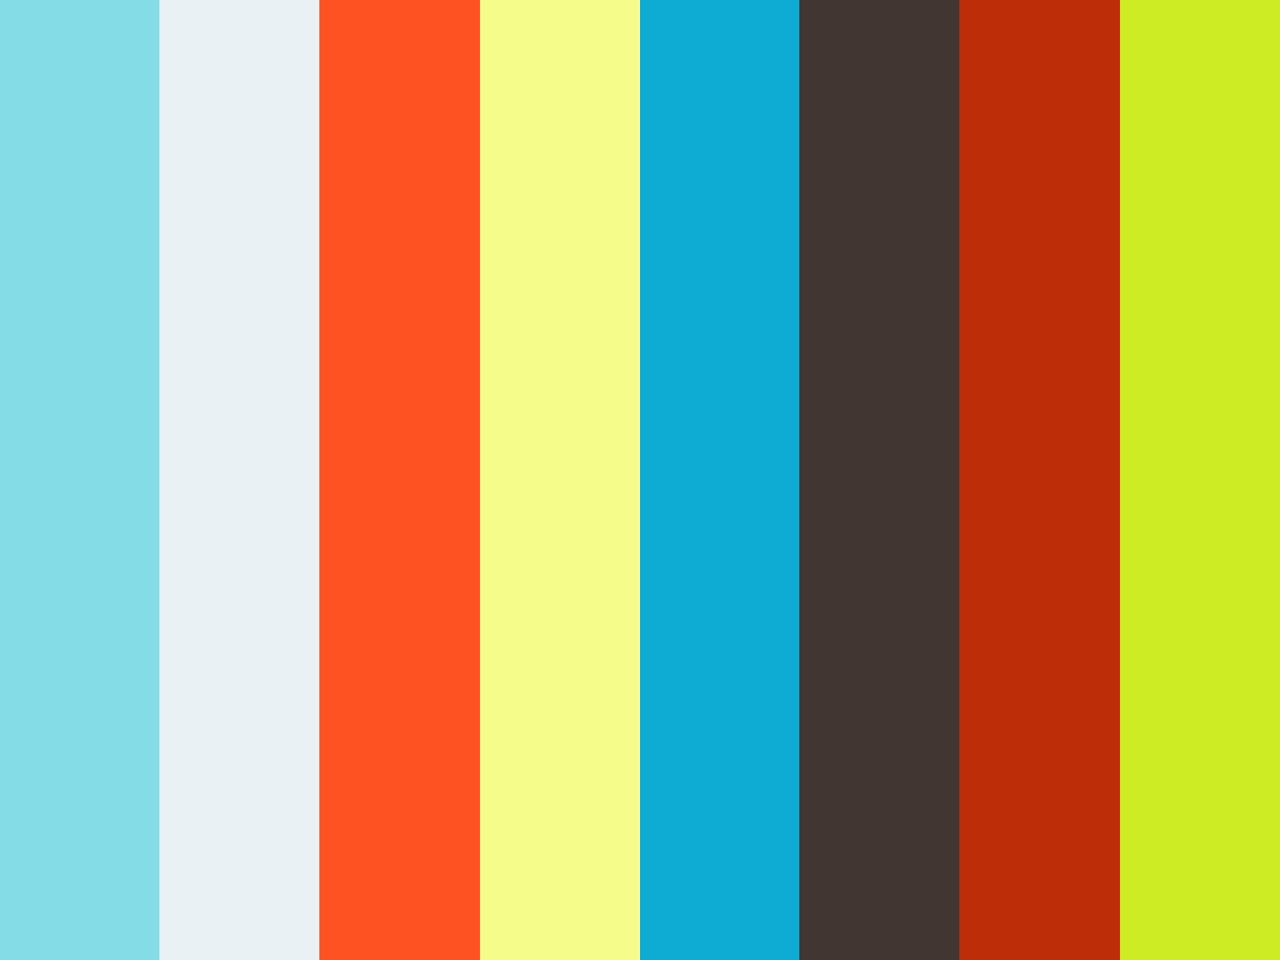 113 Branding Red Carpet TV Web Series Featuring Caren Glasser